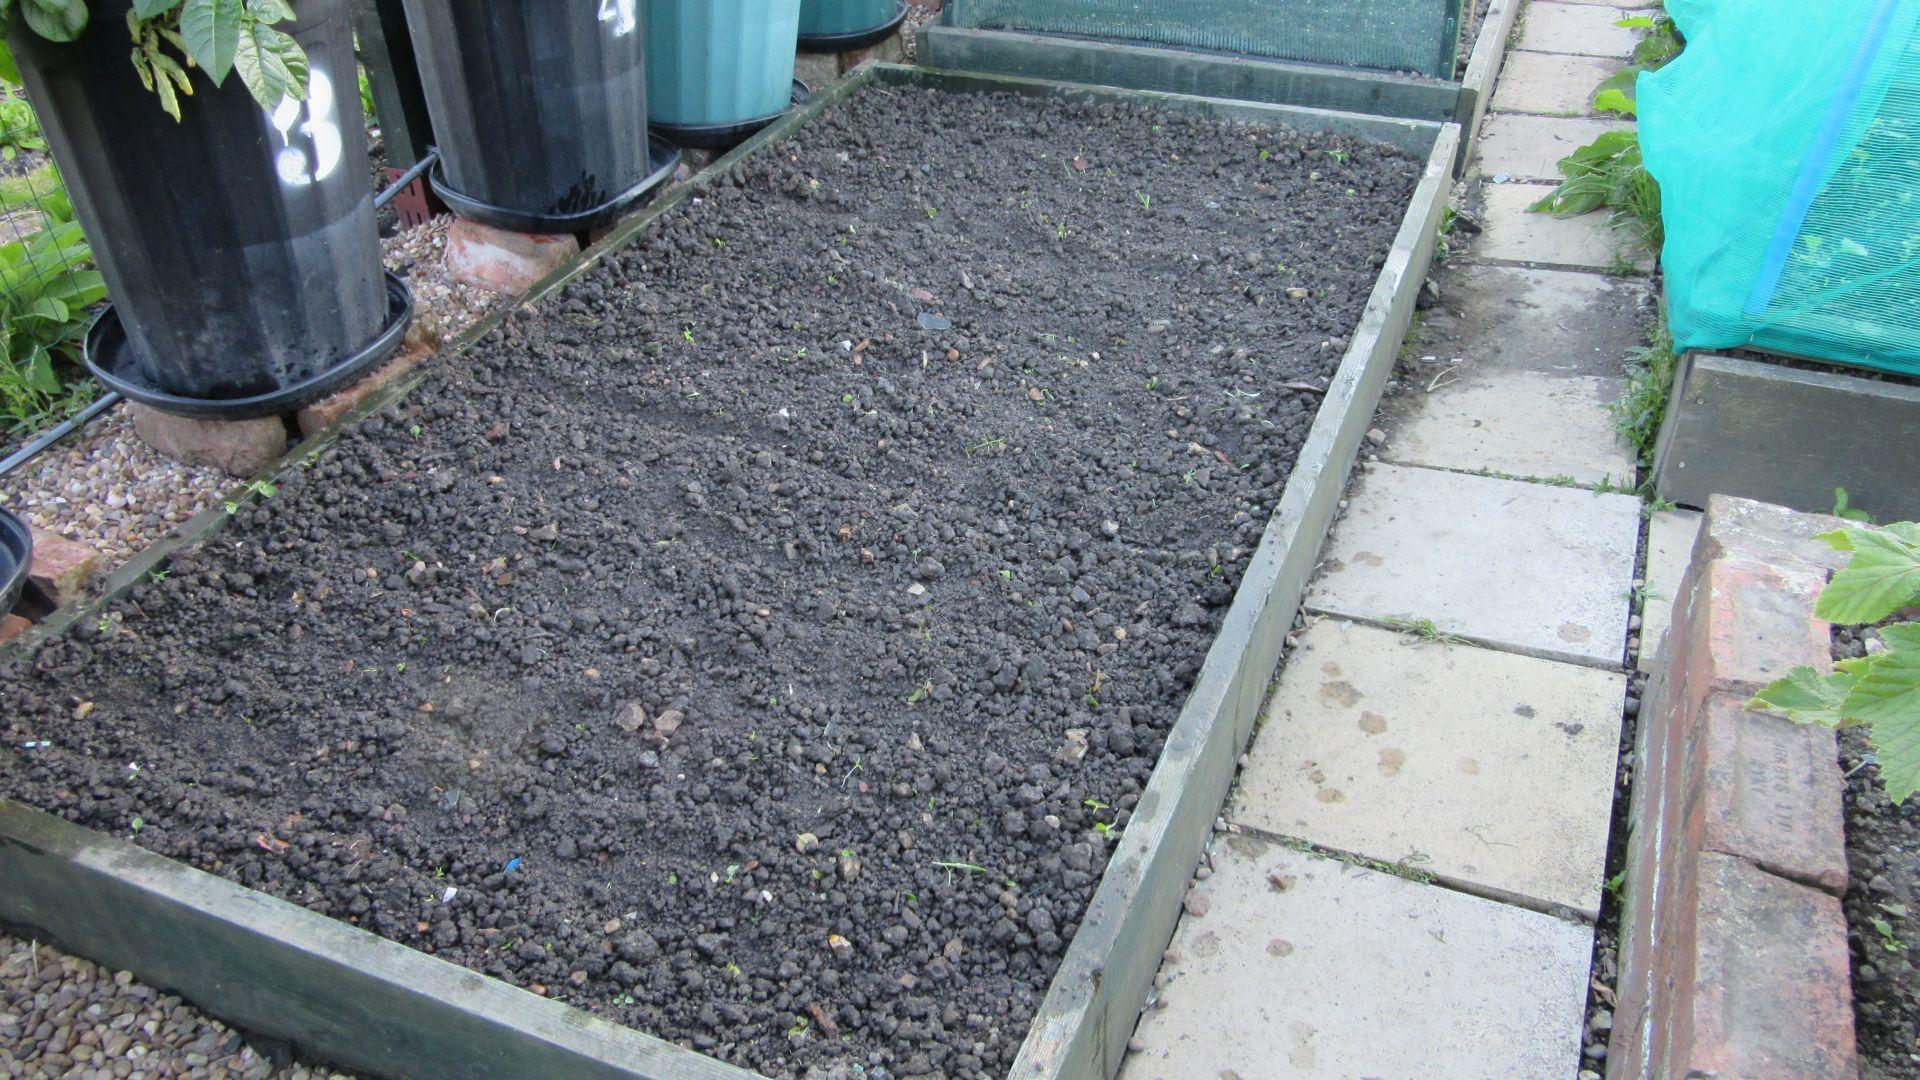 saladbed_planted